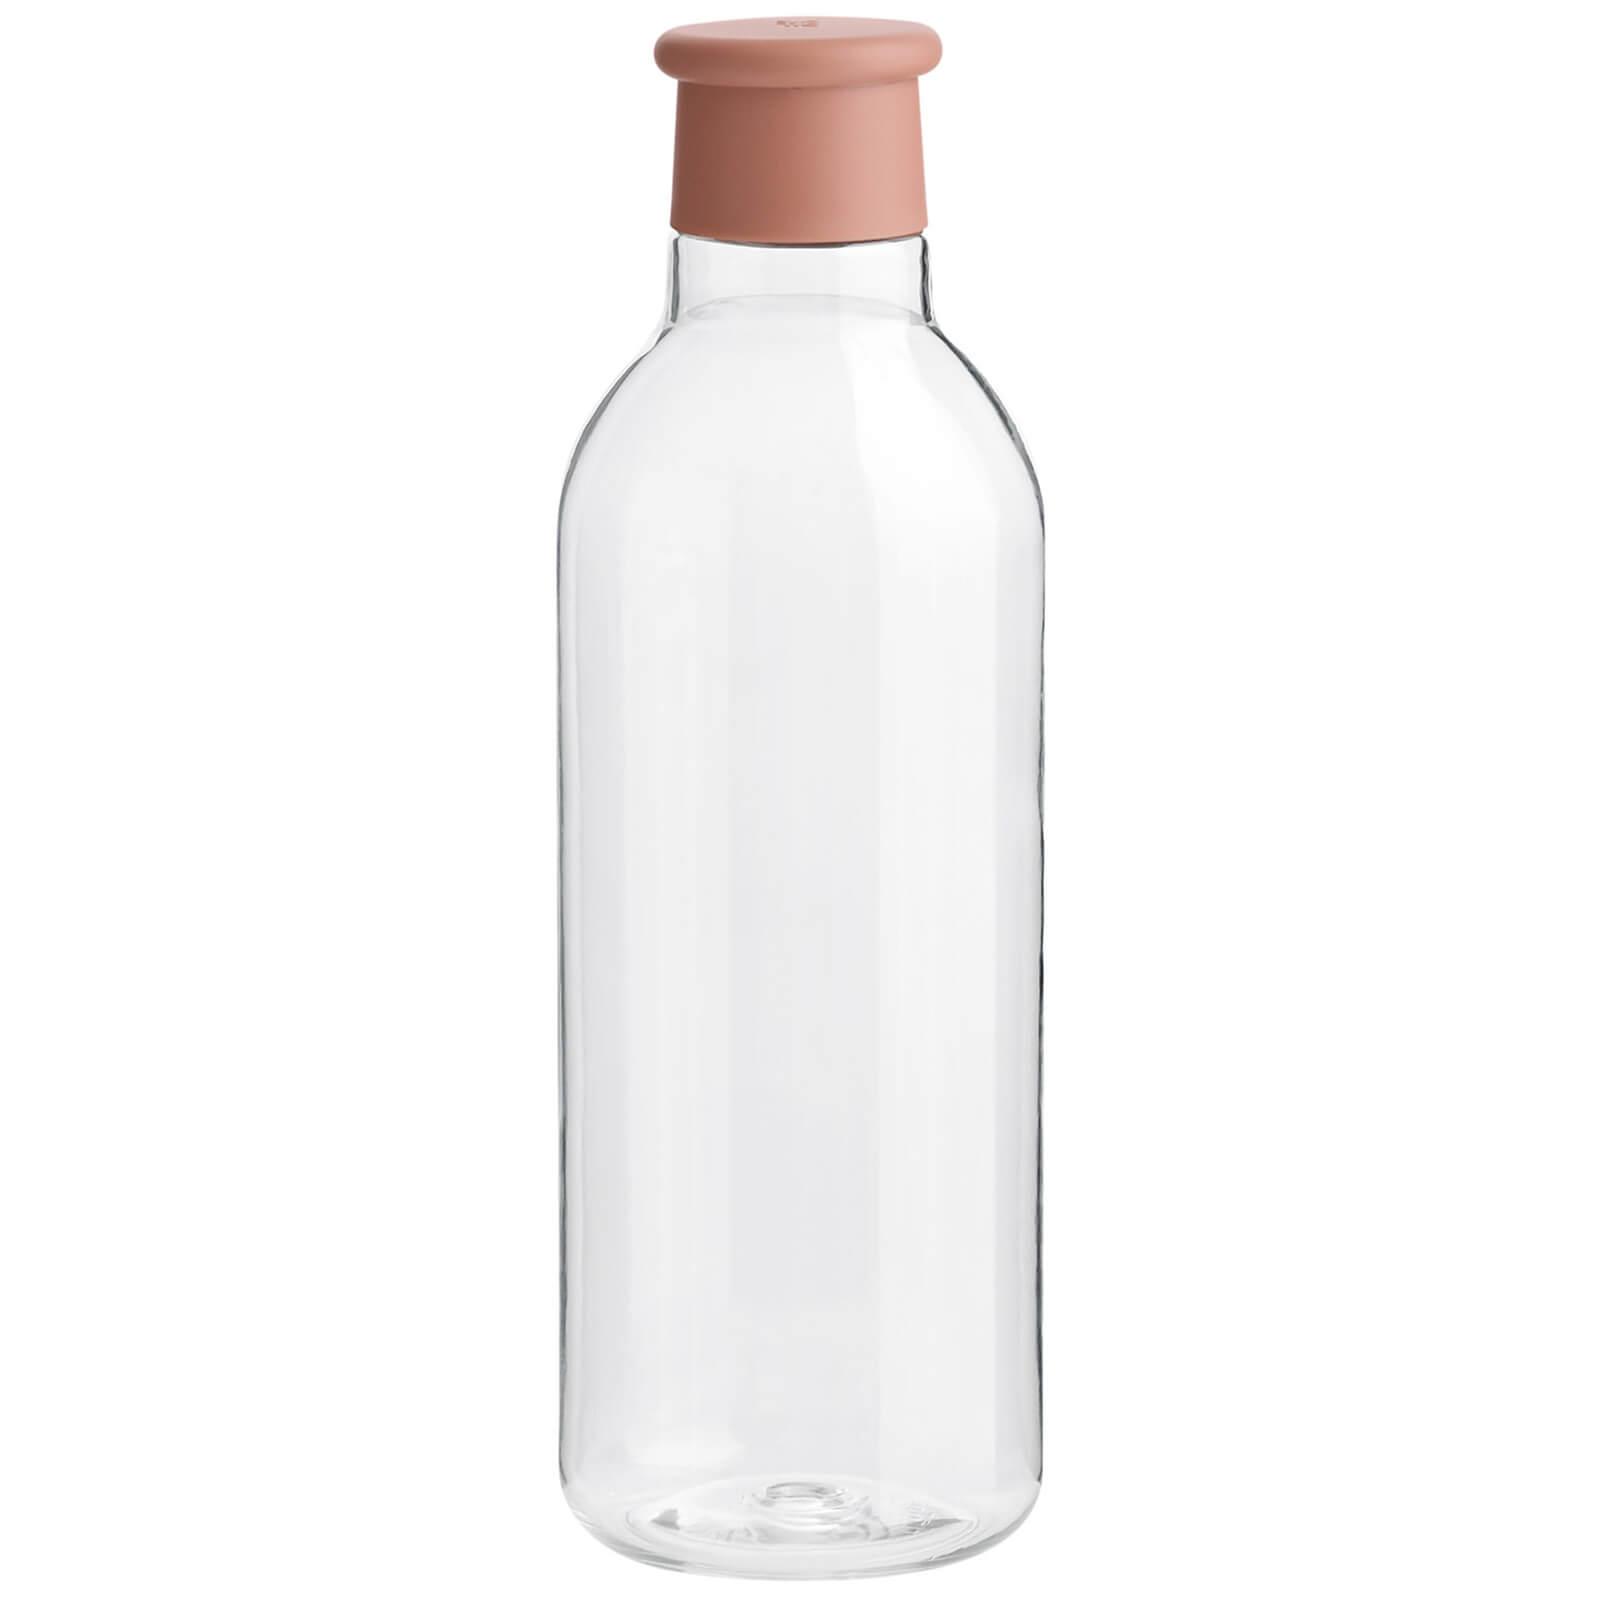 RIG-TIG Drink-It Water Bottle 0.75l - Misty Rose